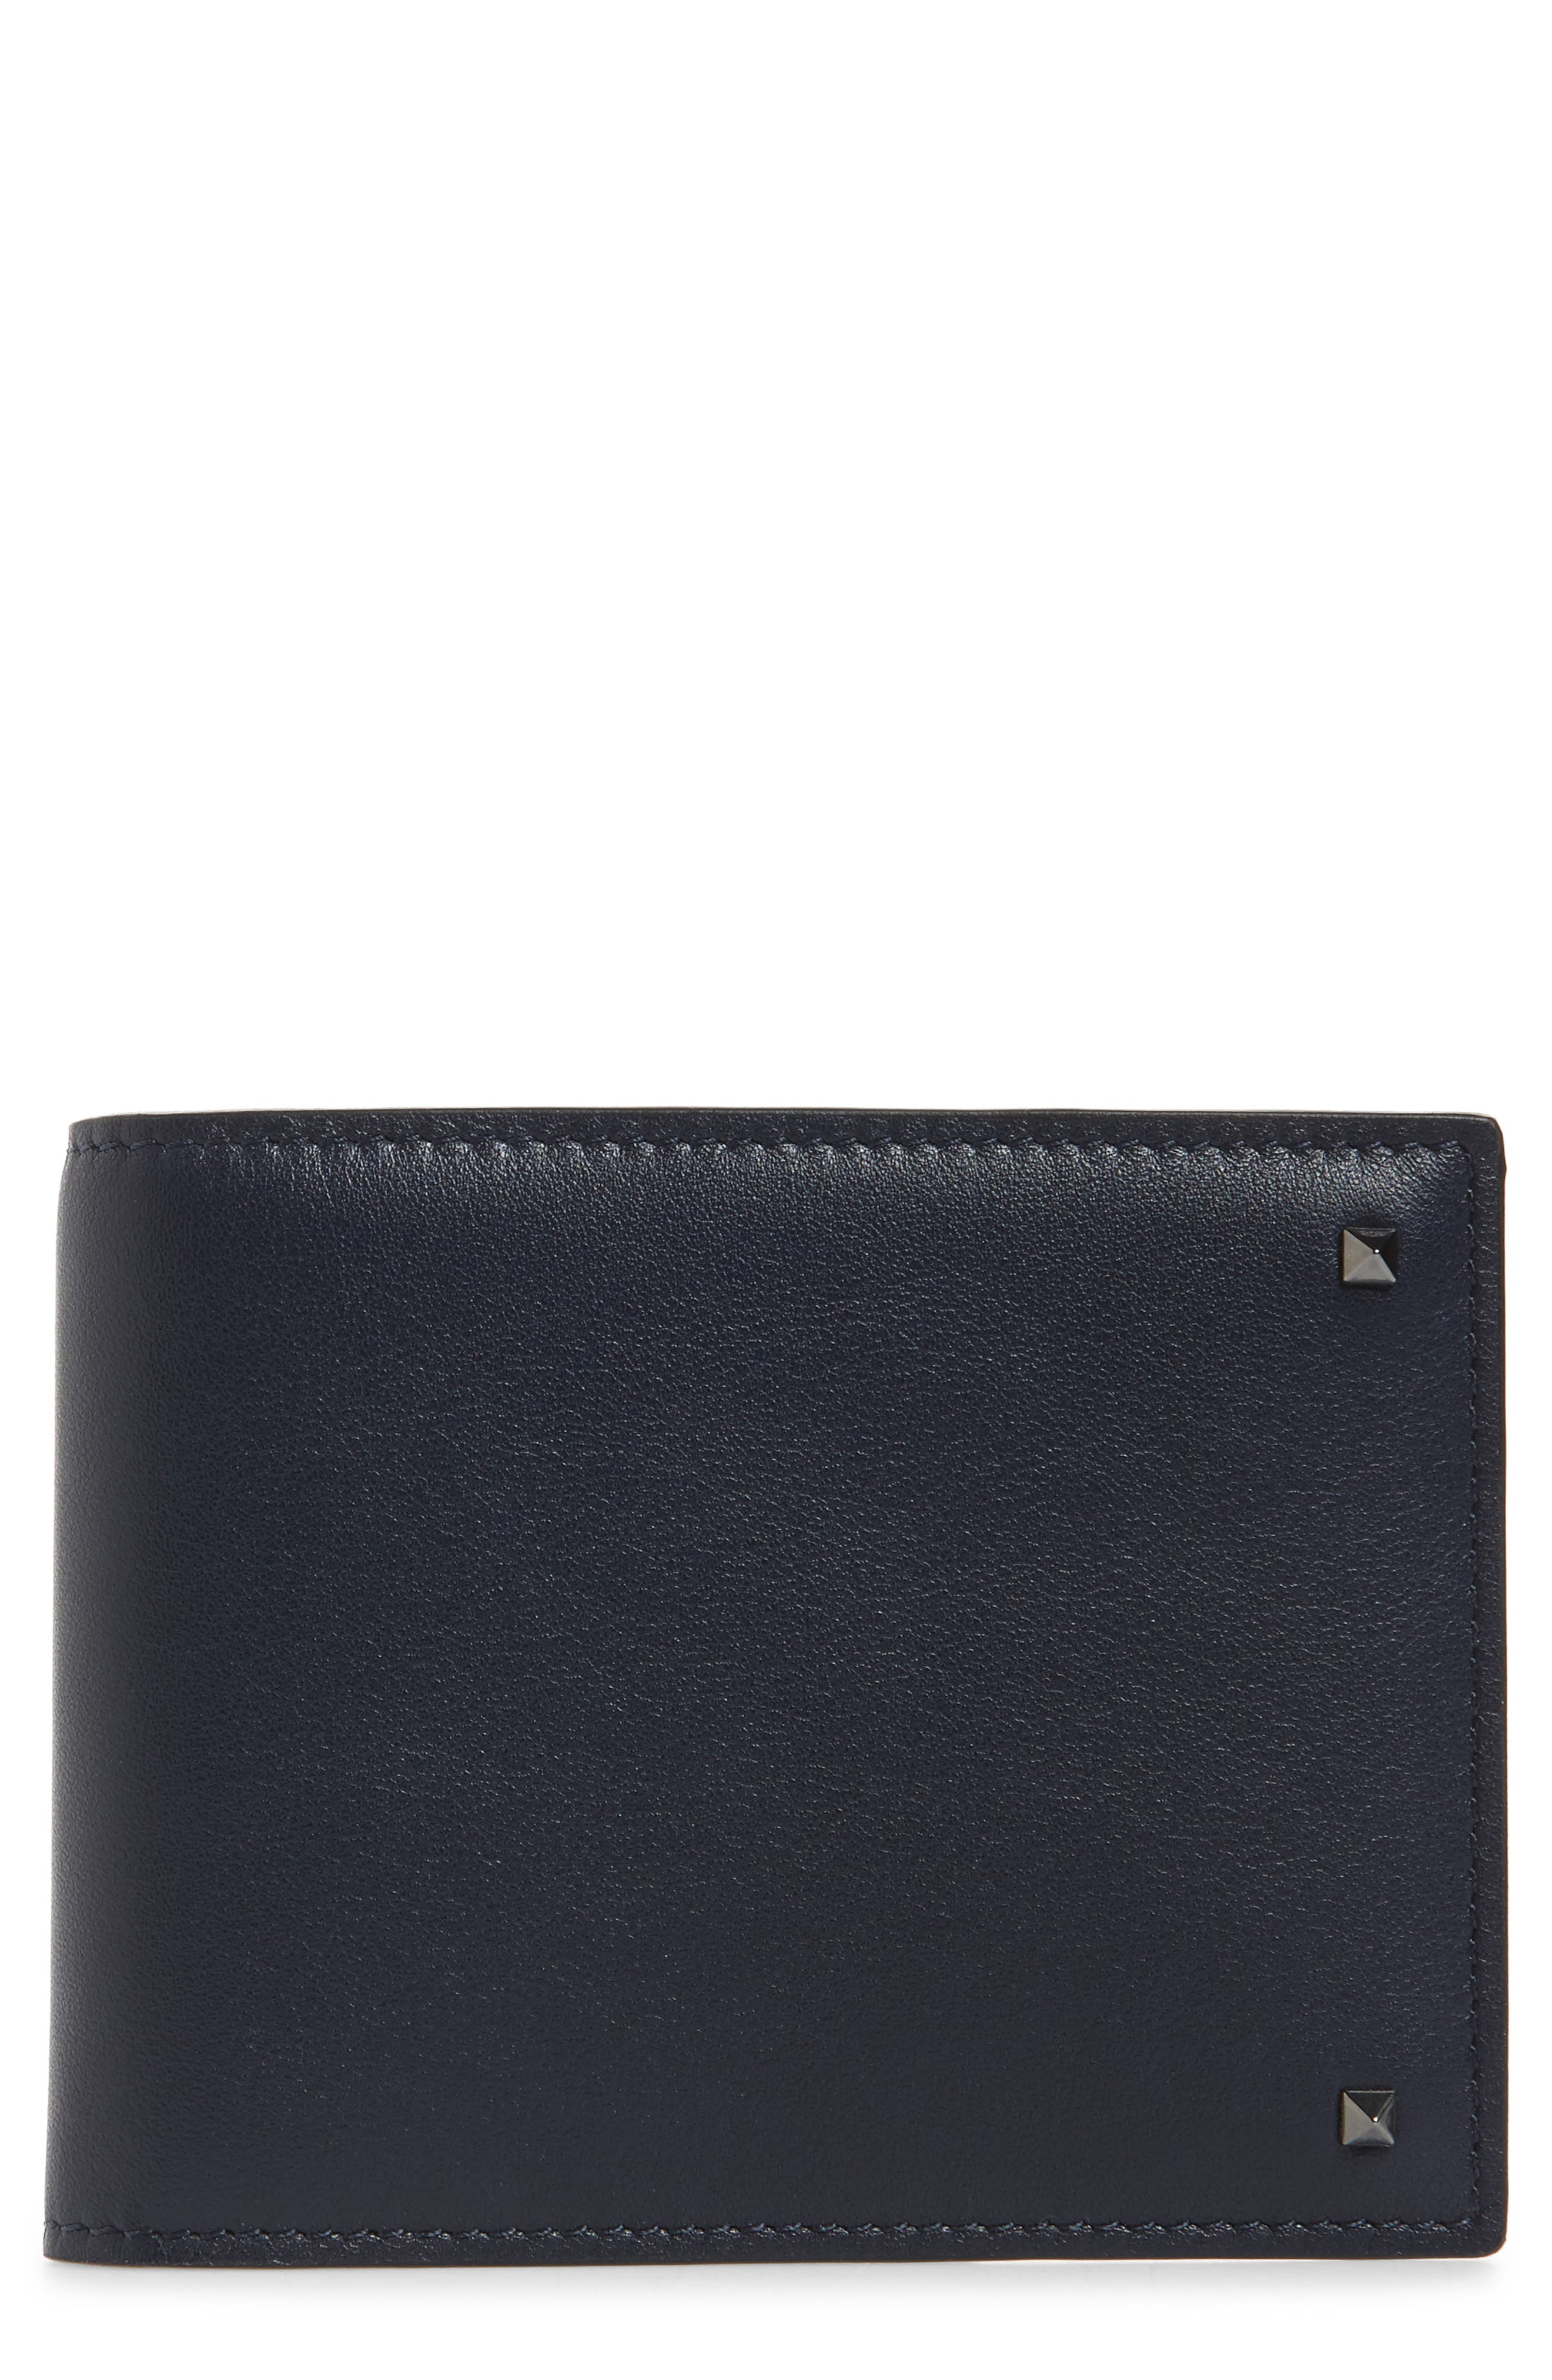 GARAVANI Stud Leather Money Clip Card Case,                             Main thumbnail 1, color,                             MARINE